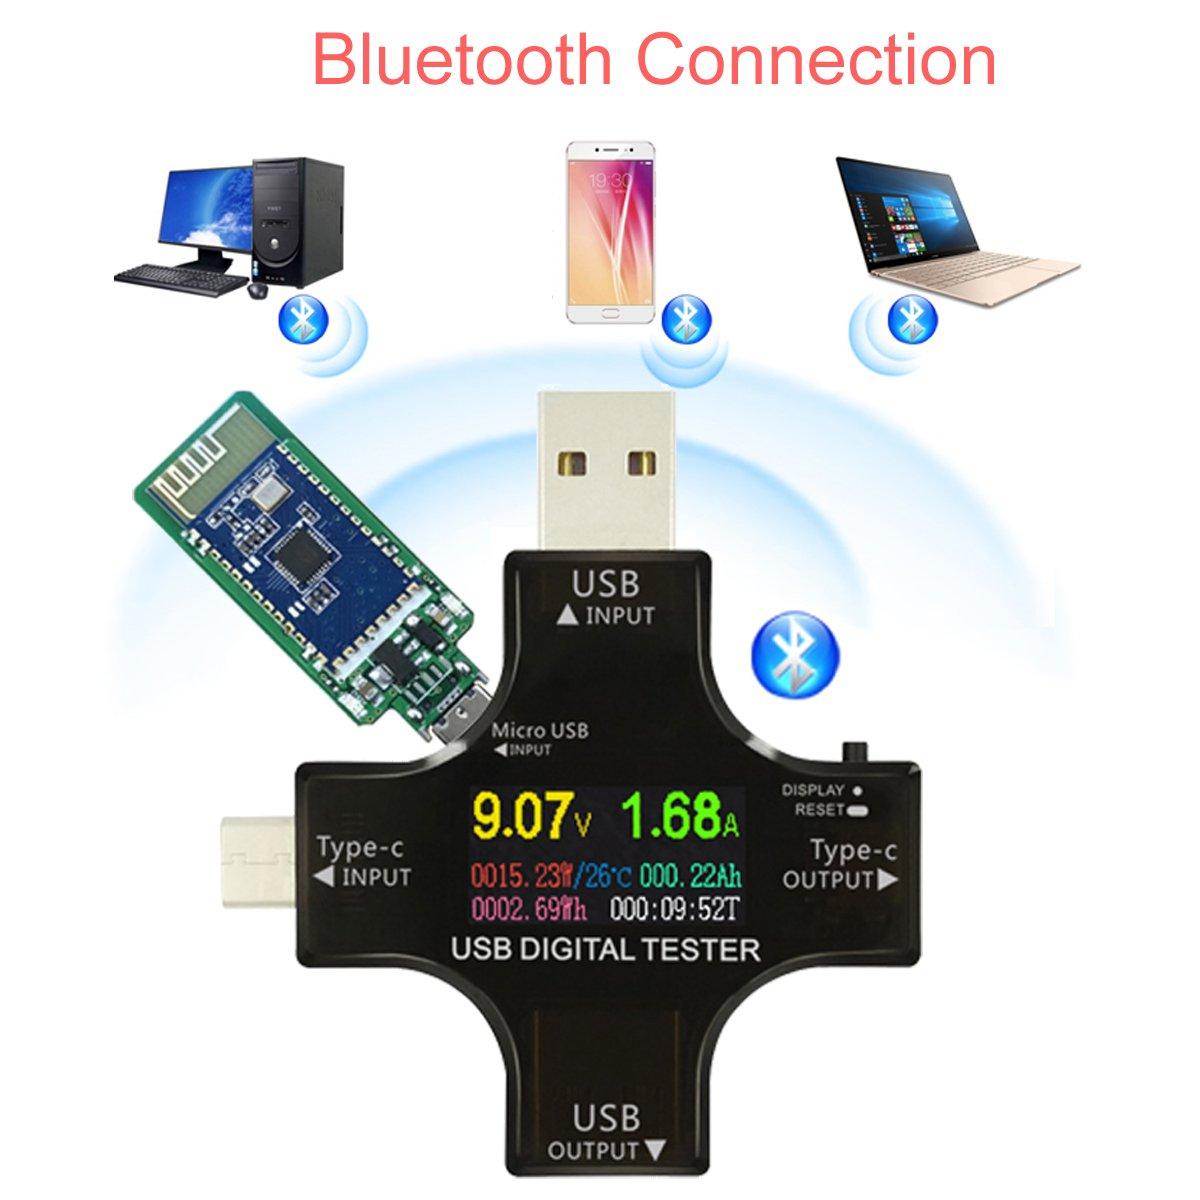 MakerHawk USB Multimeter Tester USB Type-C USB-C Voltage Tester Bluetooth Connection TFT Color Display USB Current Power Capacity Charger Amp Temperature PD Meter Tester Voltmeter Ammeter Indicator